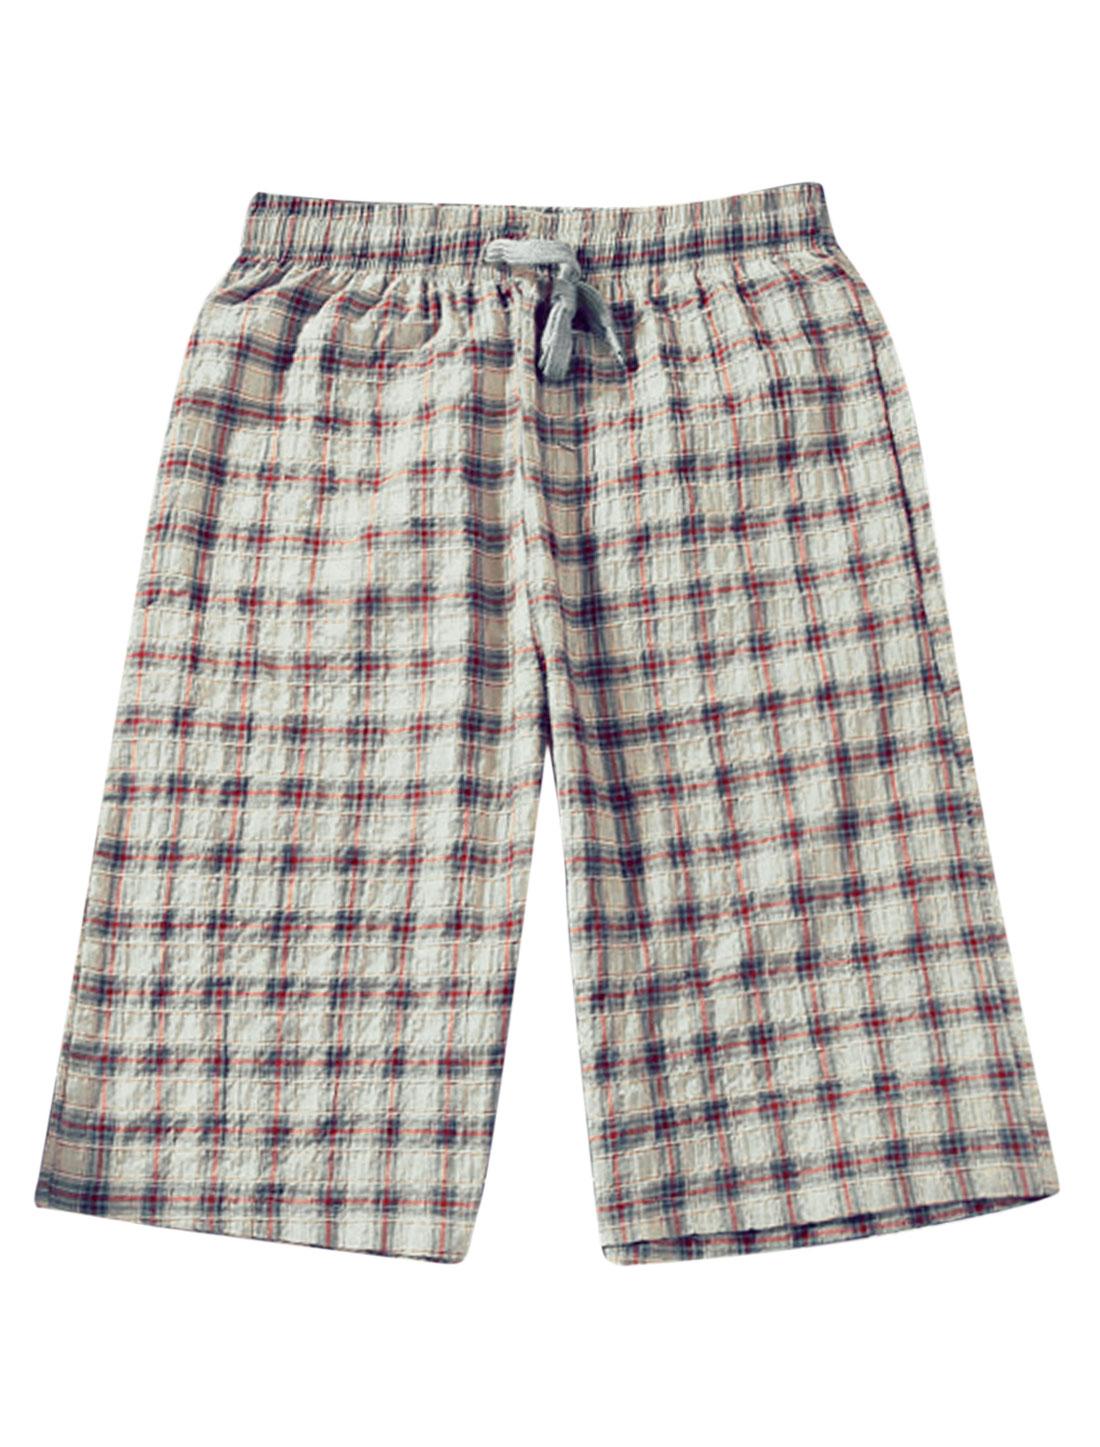 Men Drawstring Waist Check Print Pockets Short Shorts Beige Burgundy W30